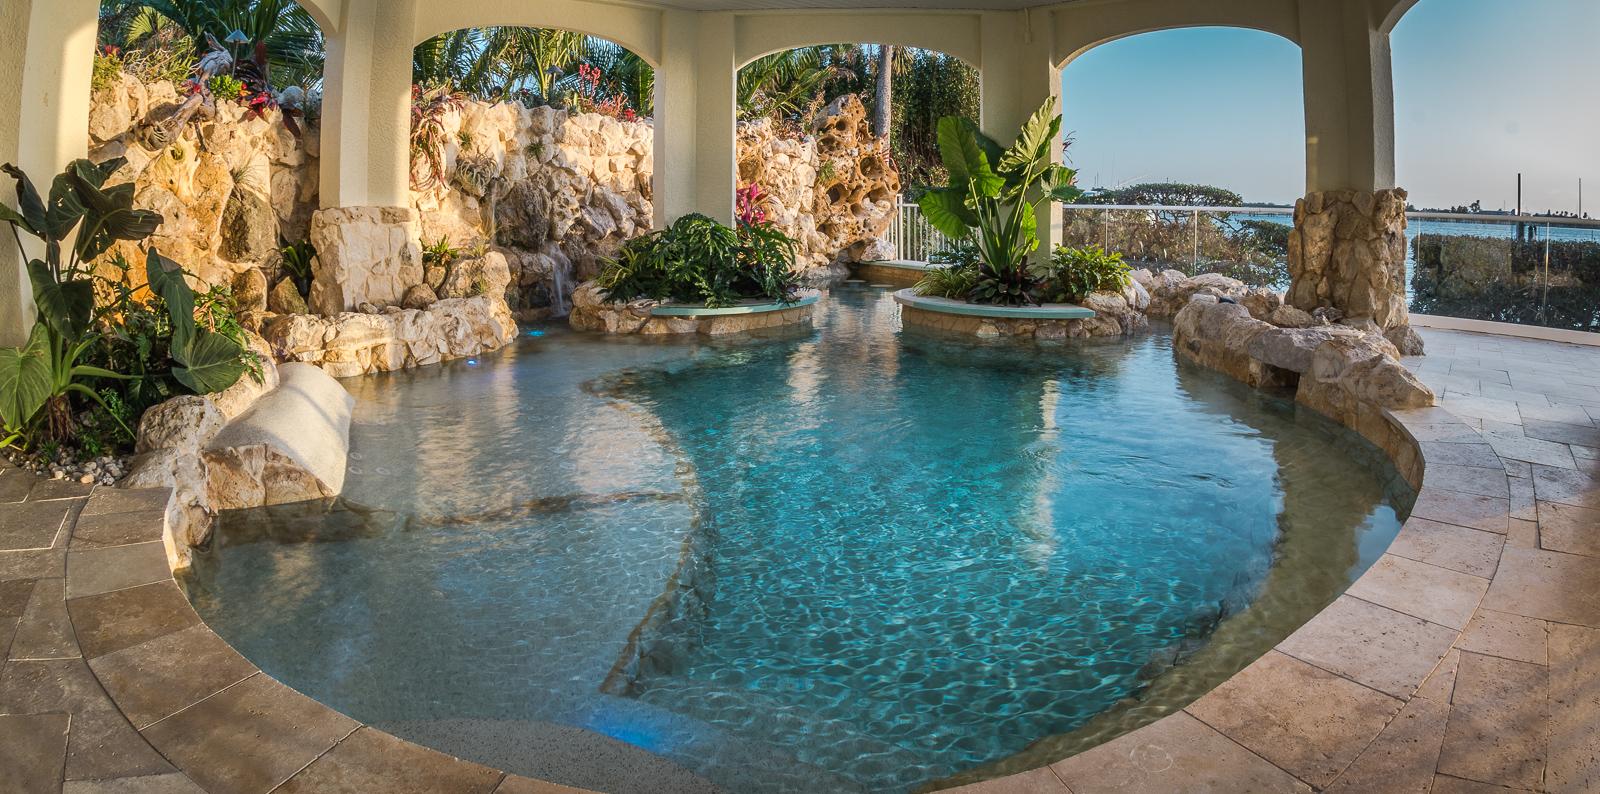 Insane pools tv episode living under the sea - Lucas lagoons ...